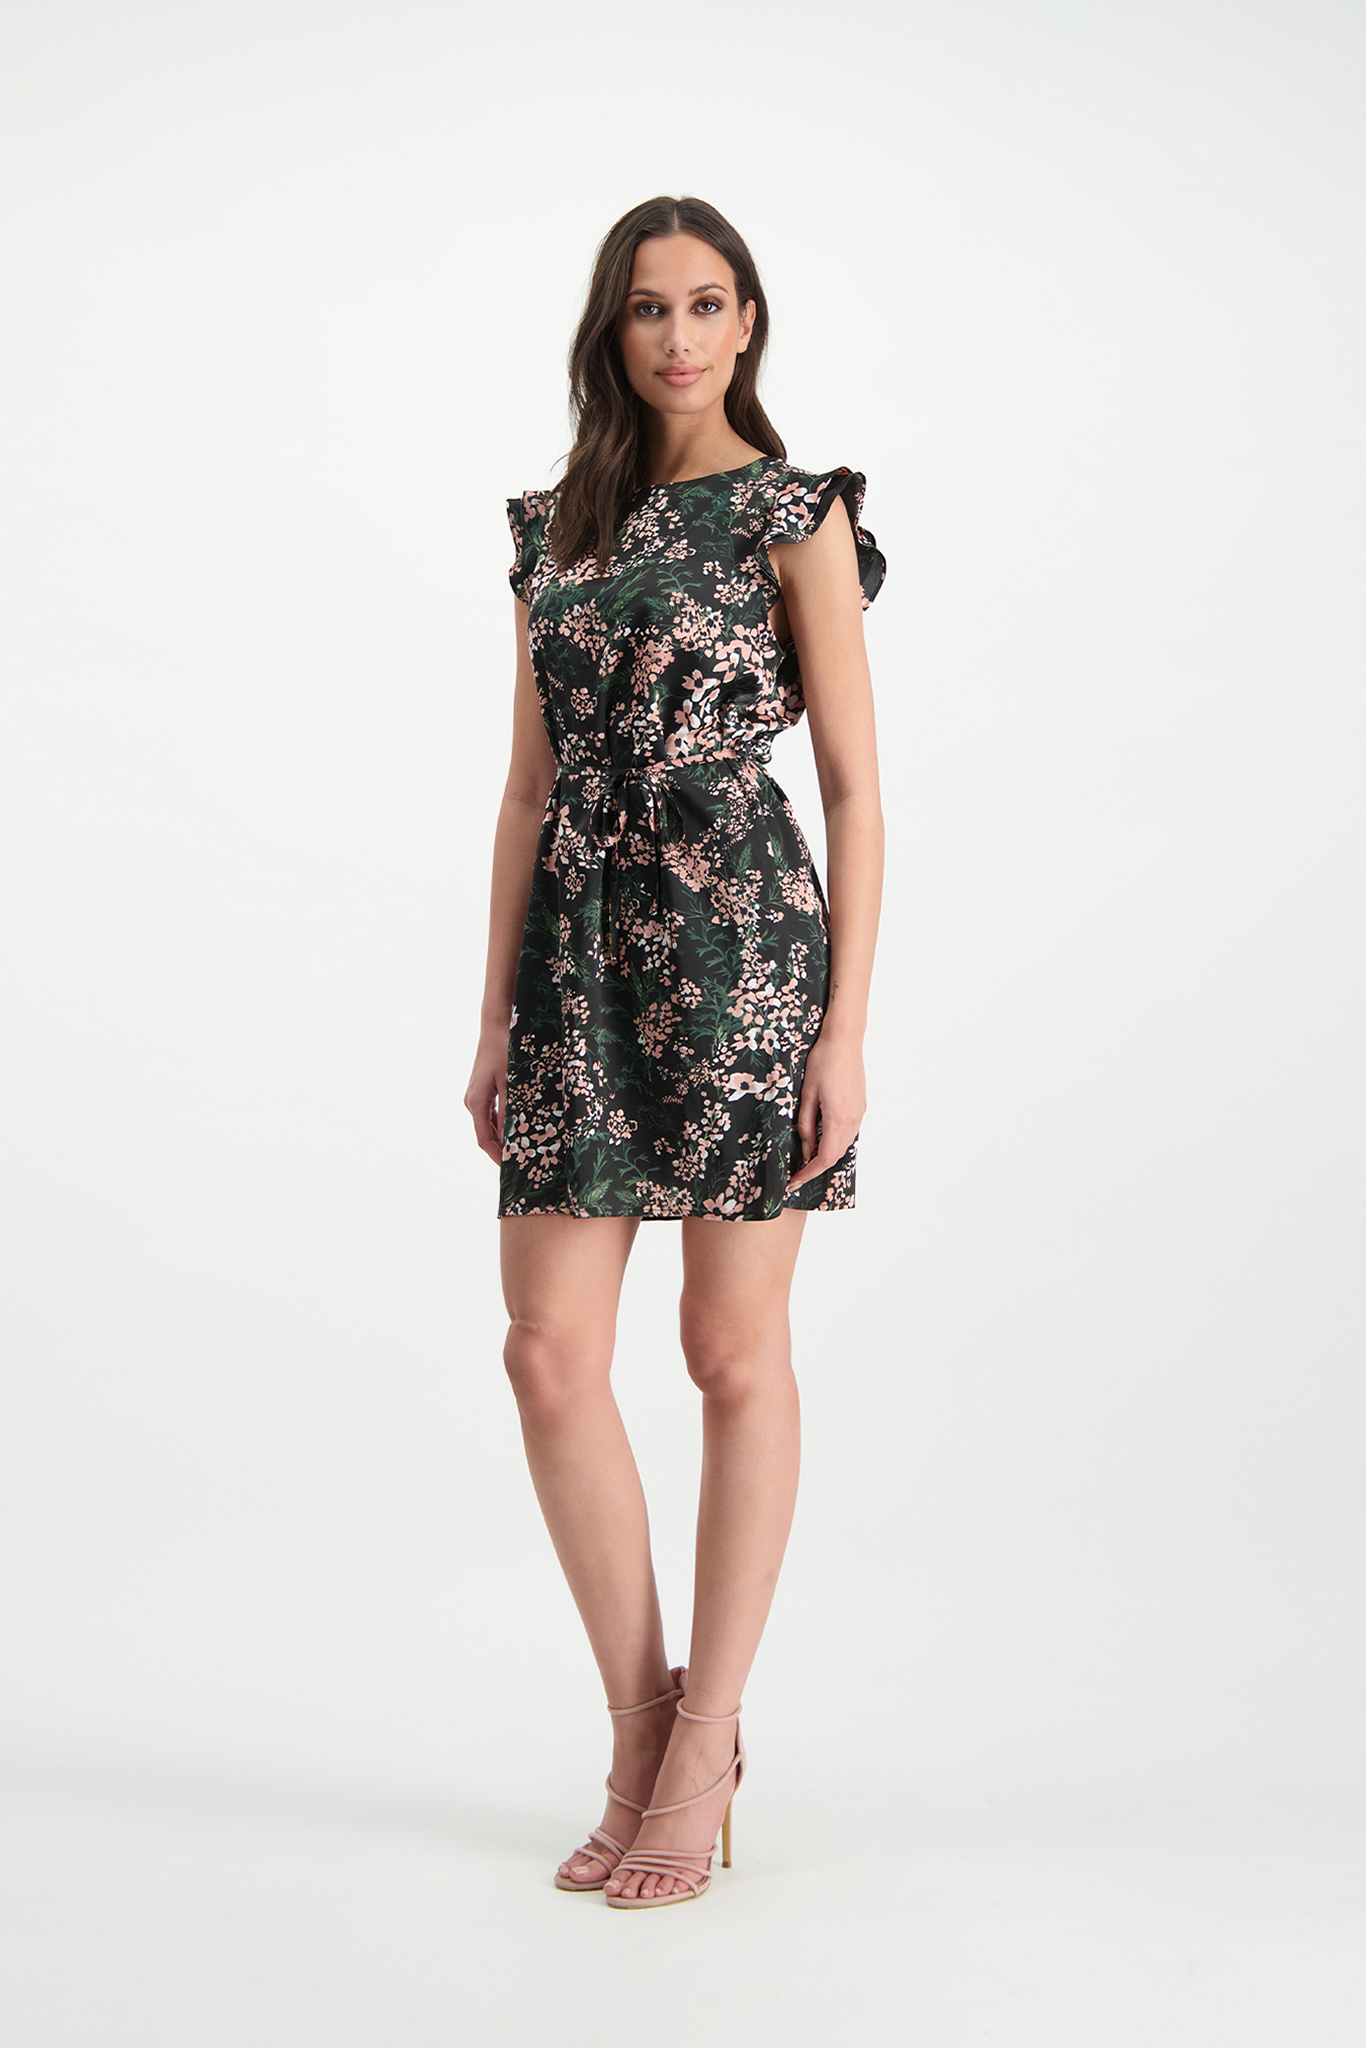 Lofty Manner Dress Sabine peach